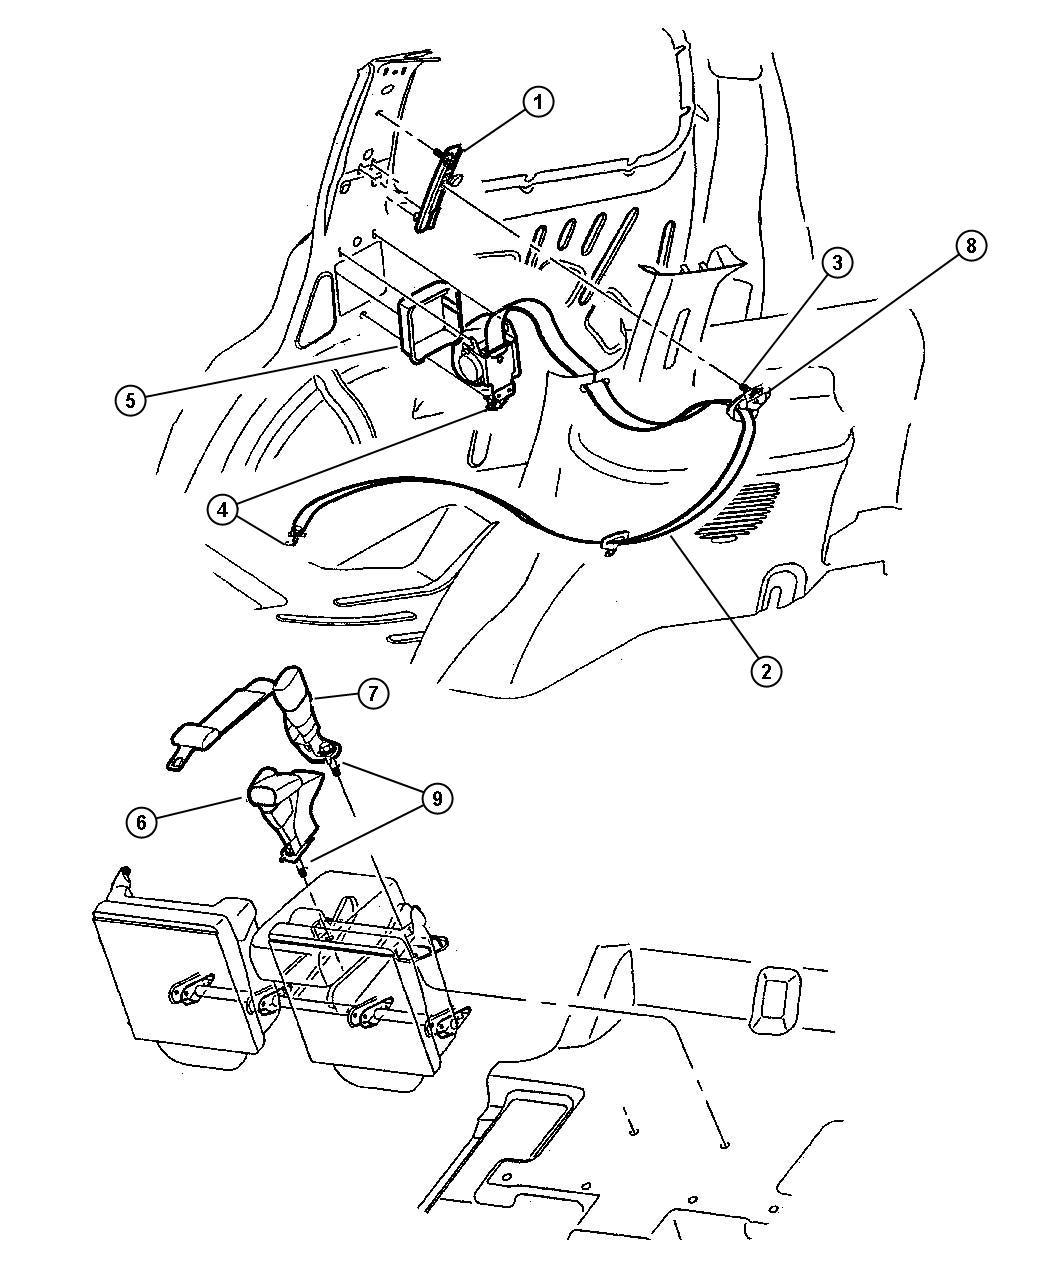 2004 jeep grand cherokee seat belt  rear inner  trim   all trim codes  color   mist gray